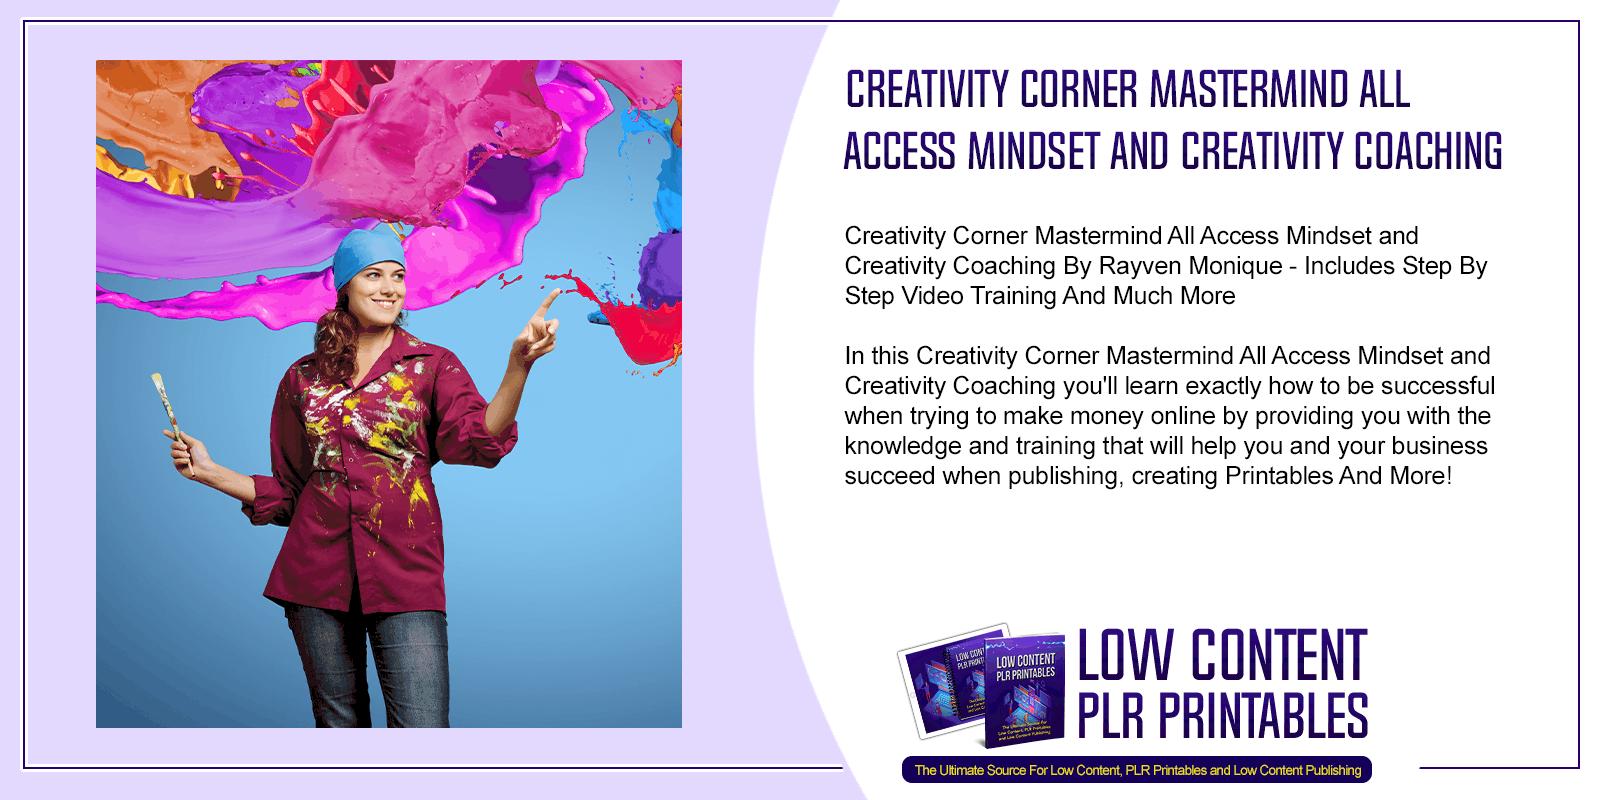 Creativity Corner Mastermind All Access Mindset and Creativity Coaching